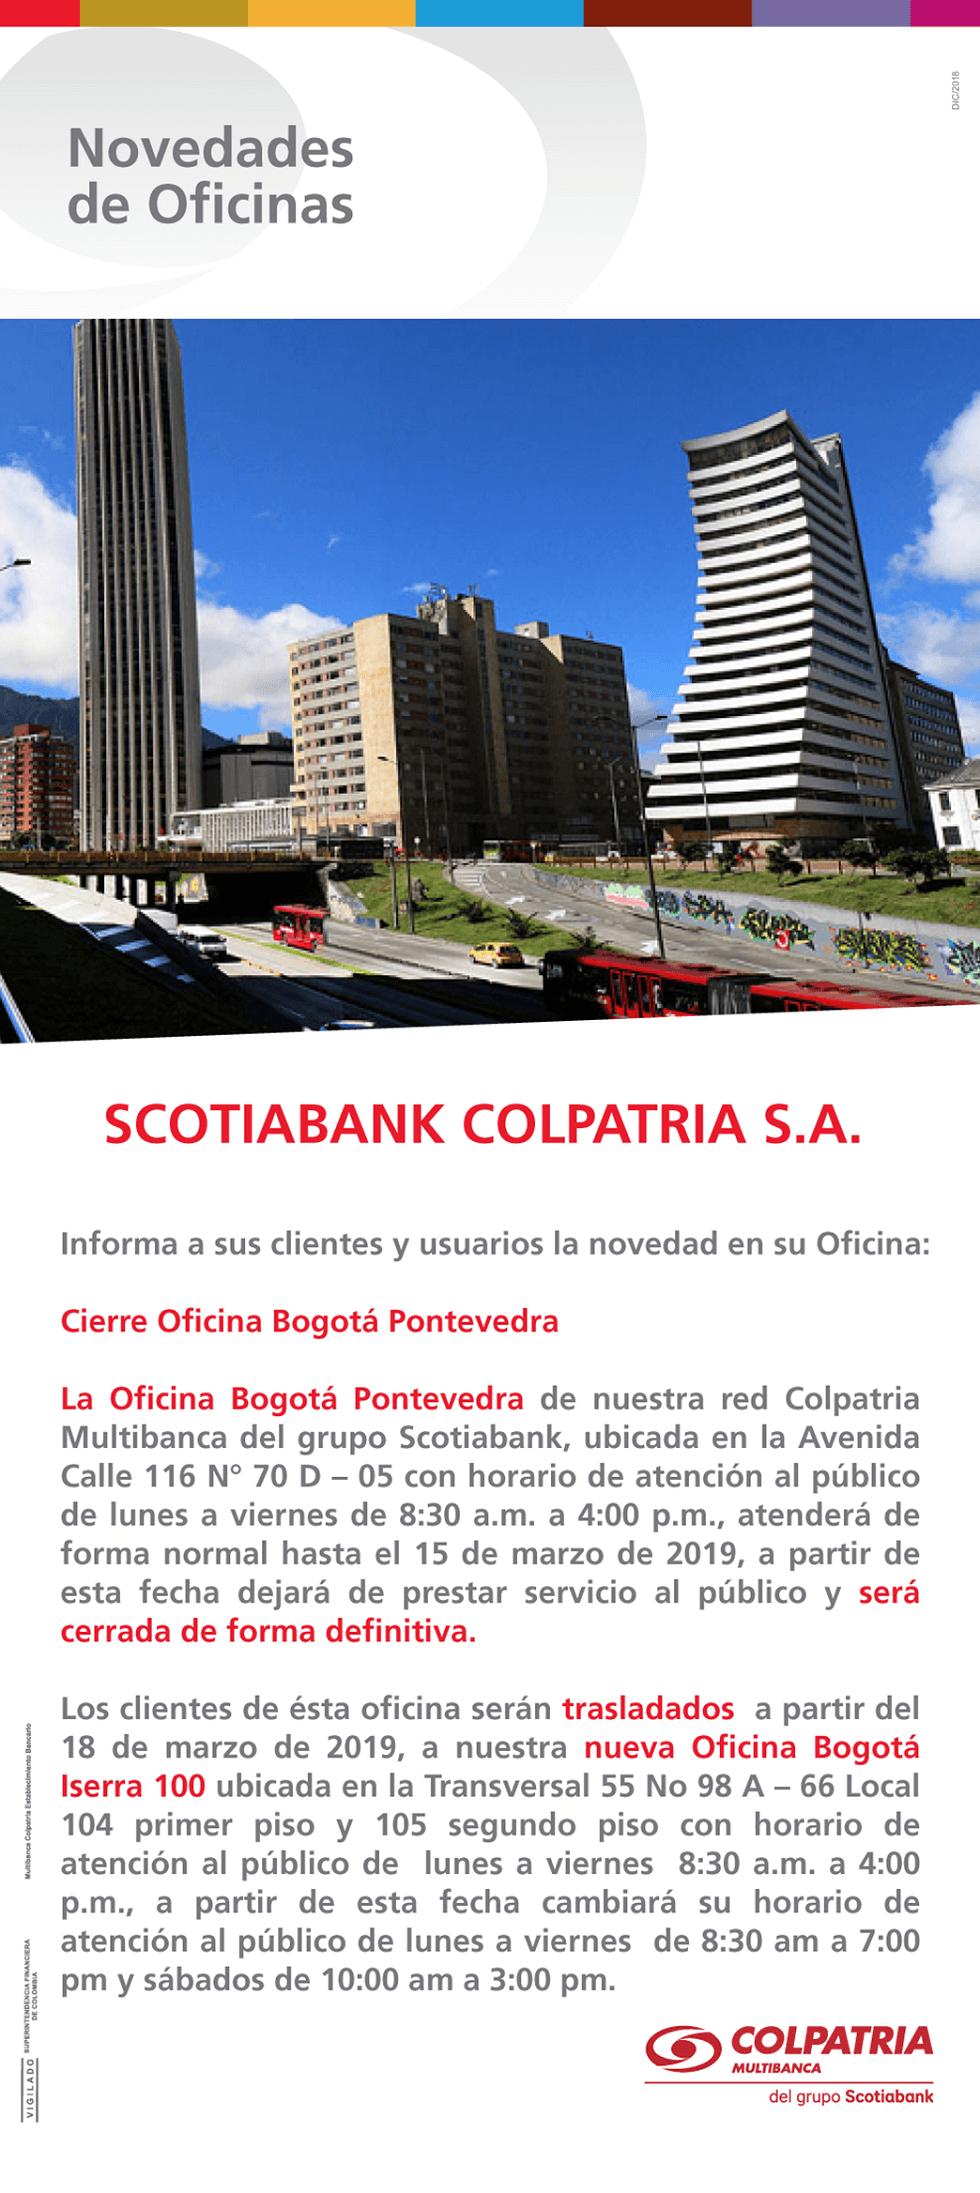 Cierre oficina Bogotá Pontevedra